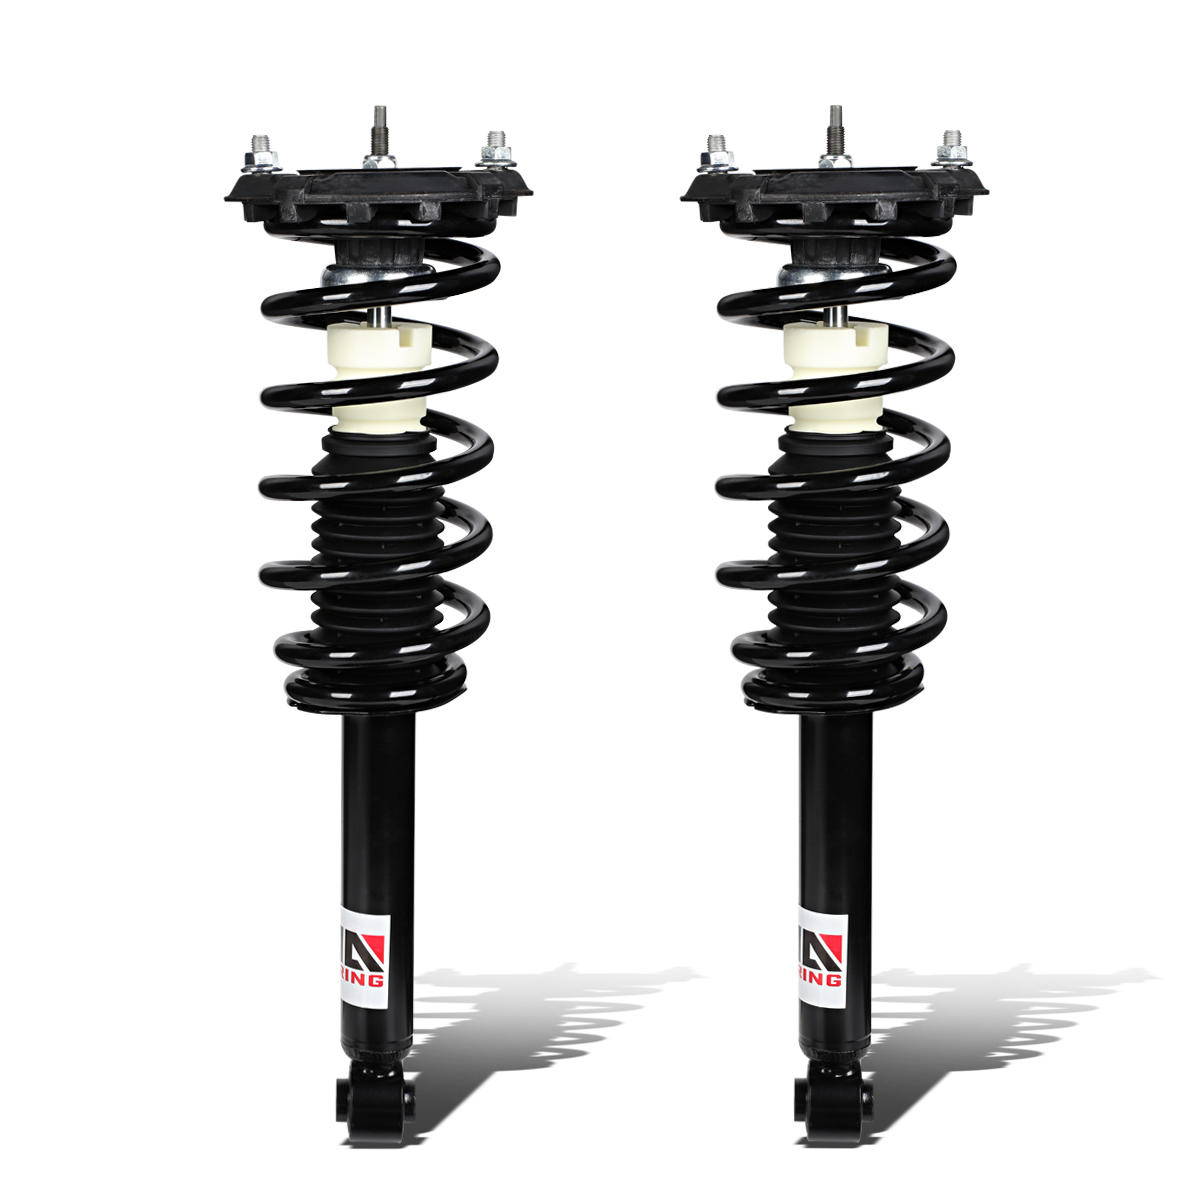 20002003 Nissan Maxima Blower Motor Amplifier Resistor Replacement